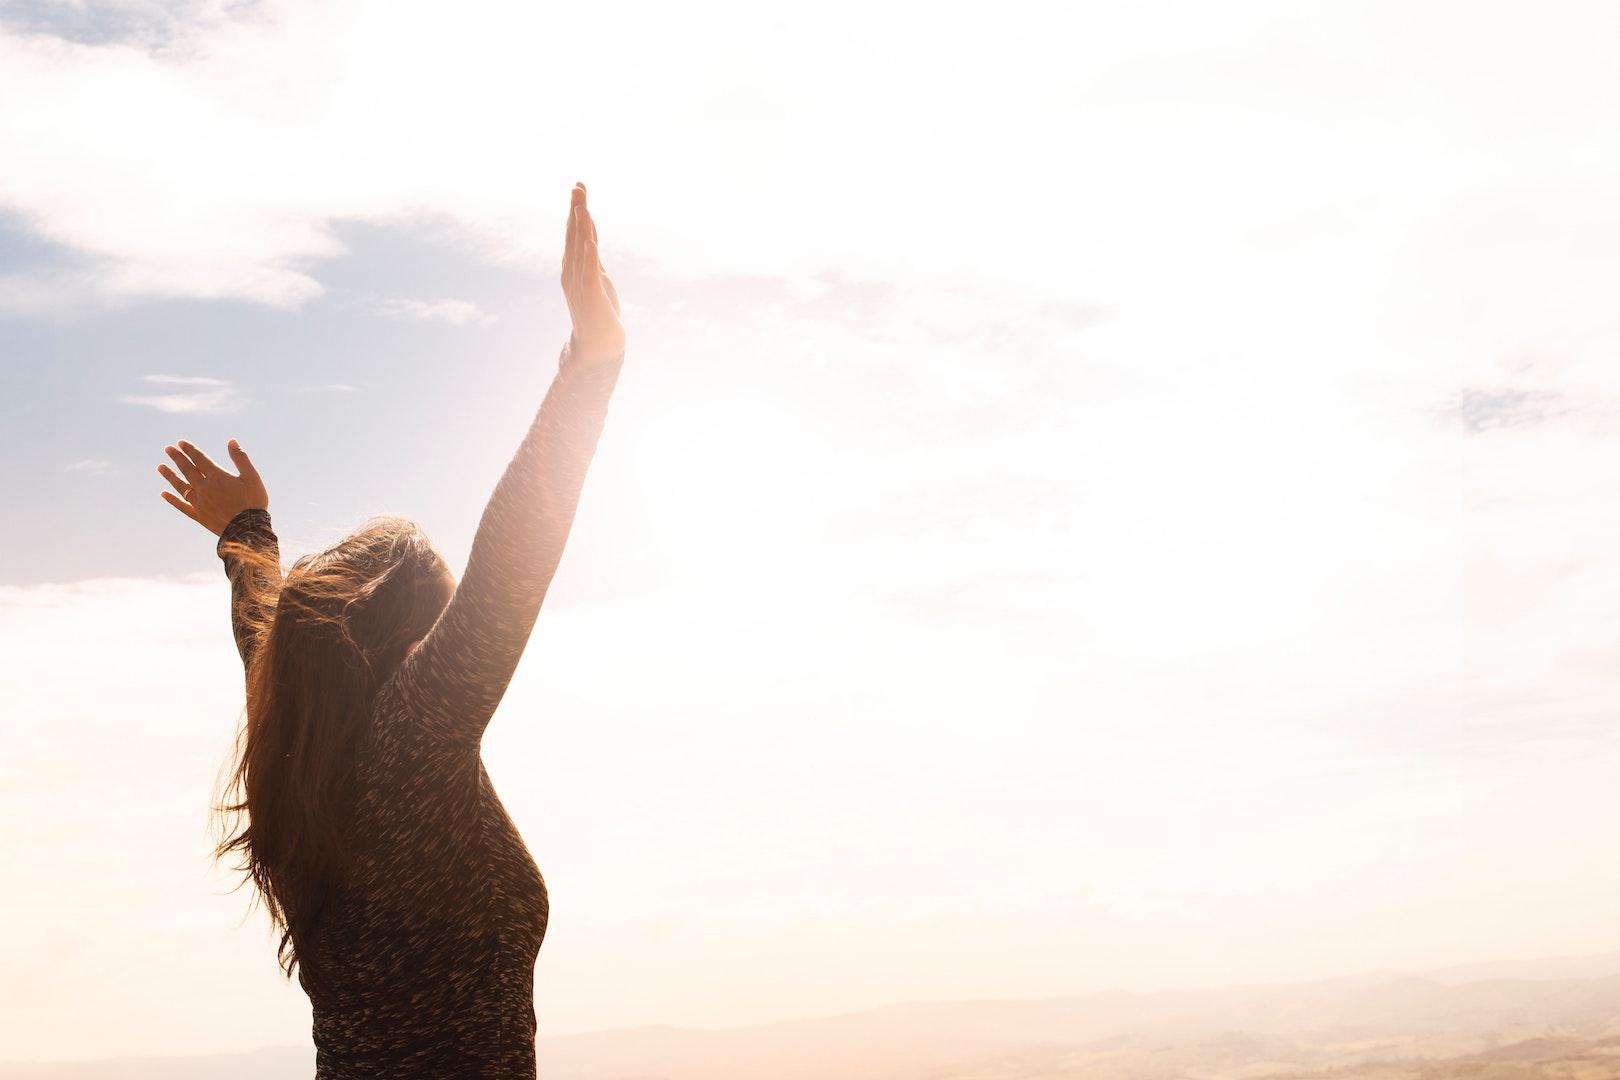 woman-raising-both-hands